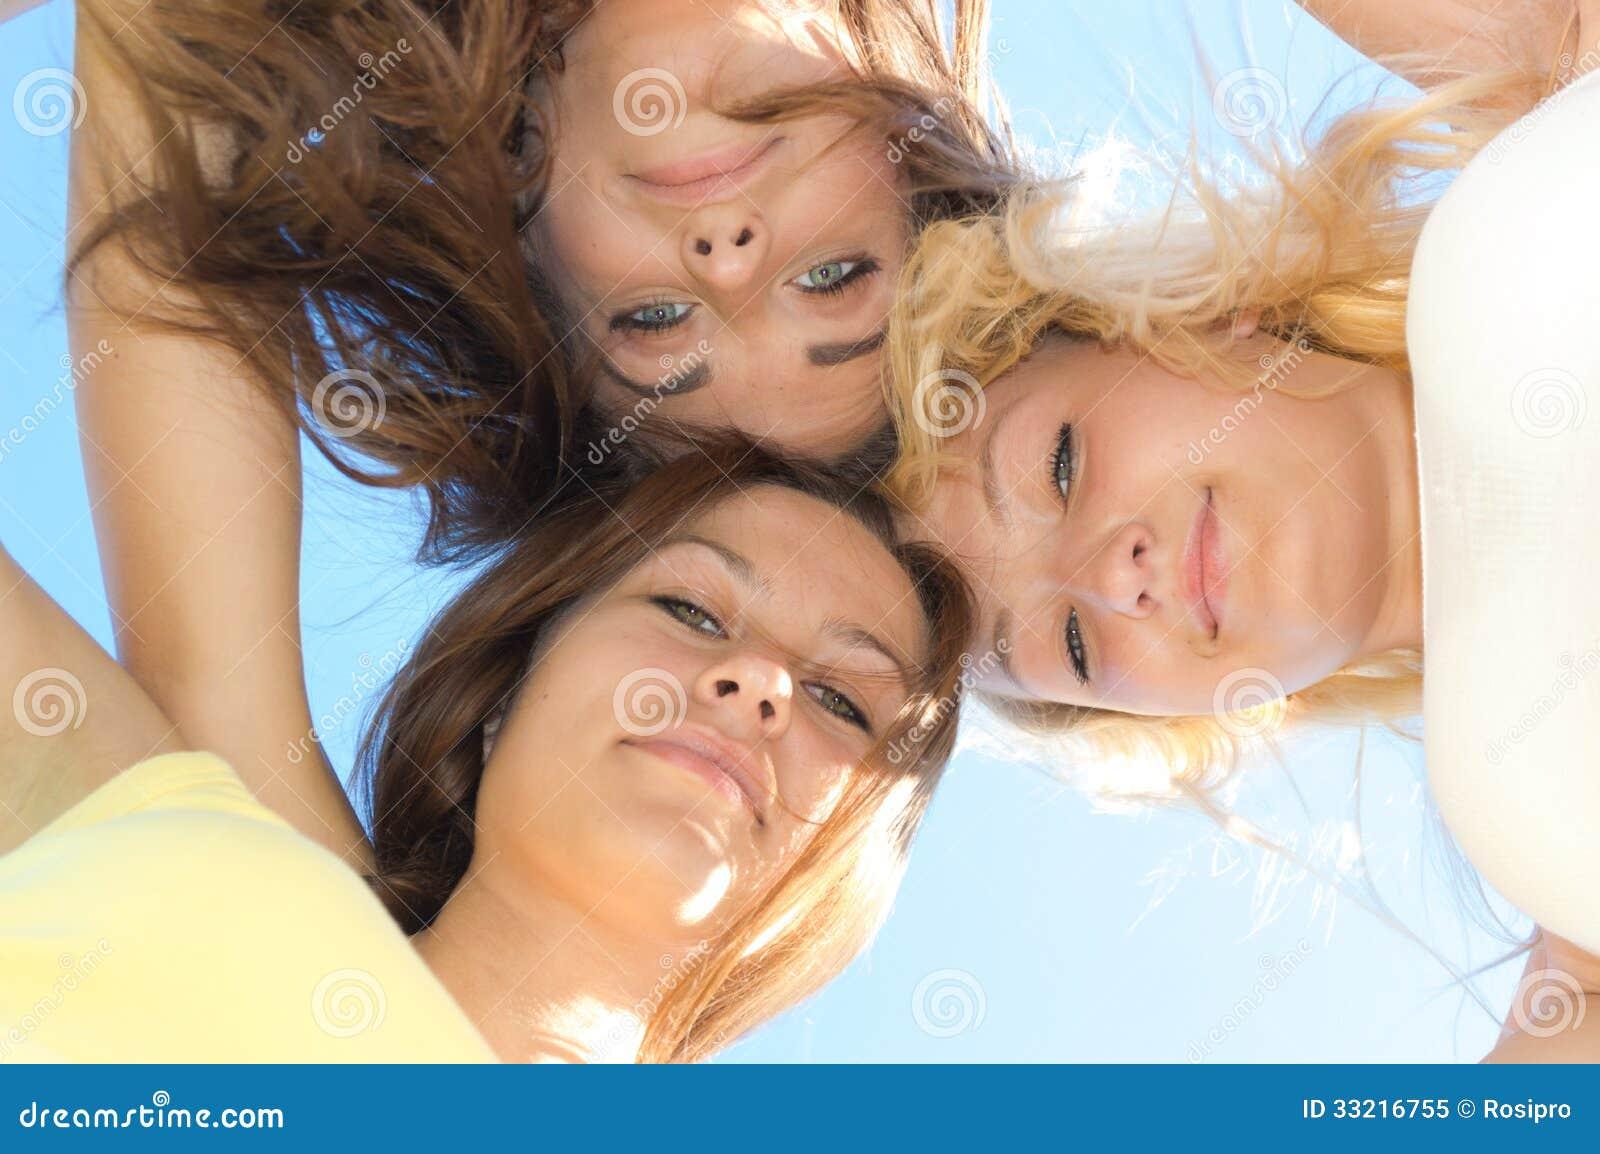 girls masterbateing them selfs